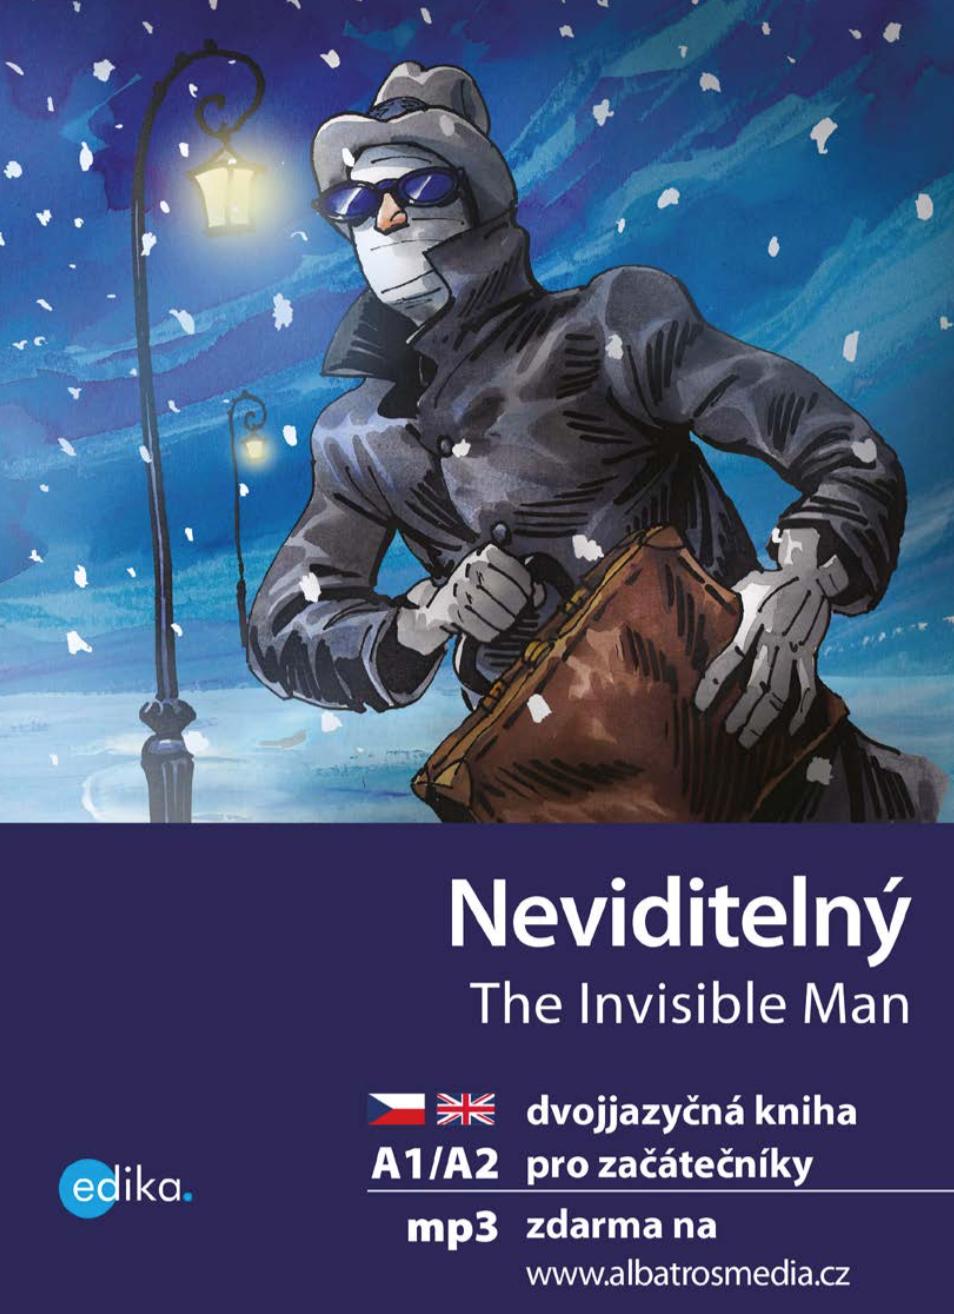 Neviditelný / The Invisible Man